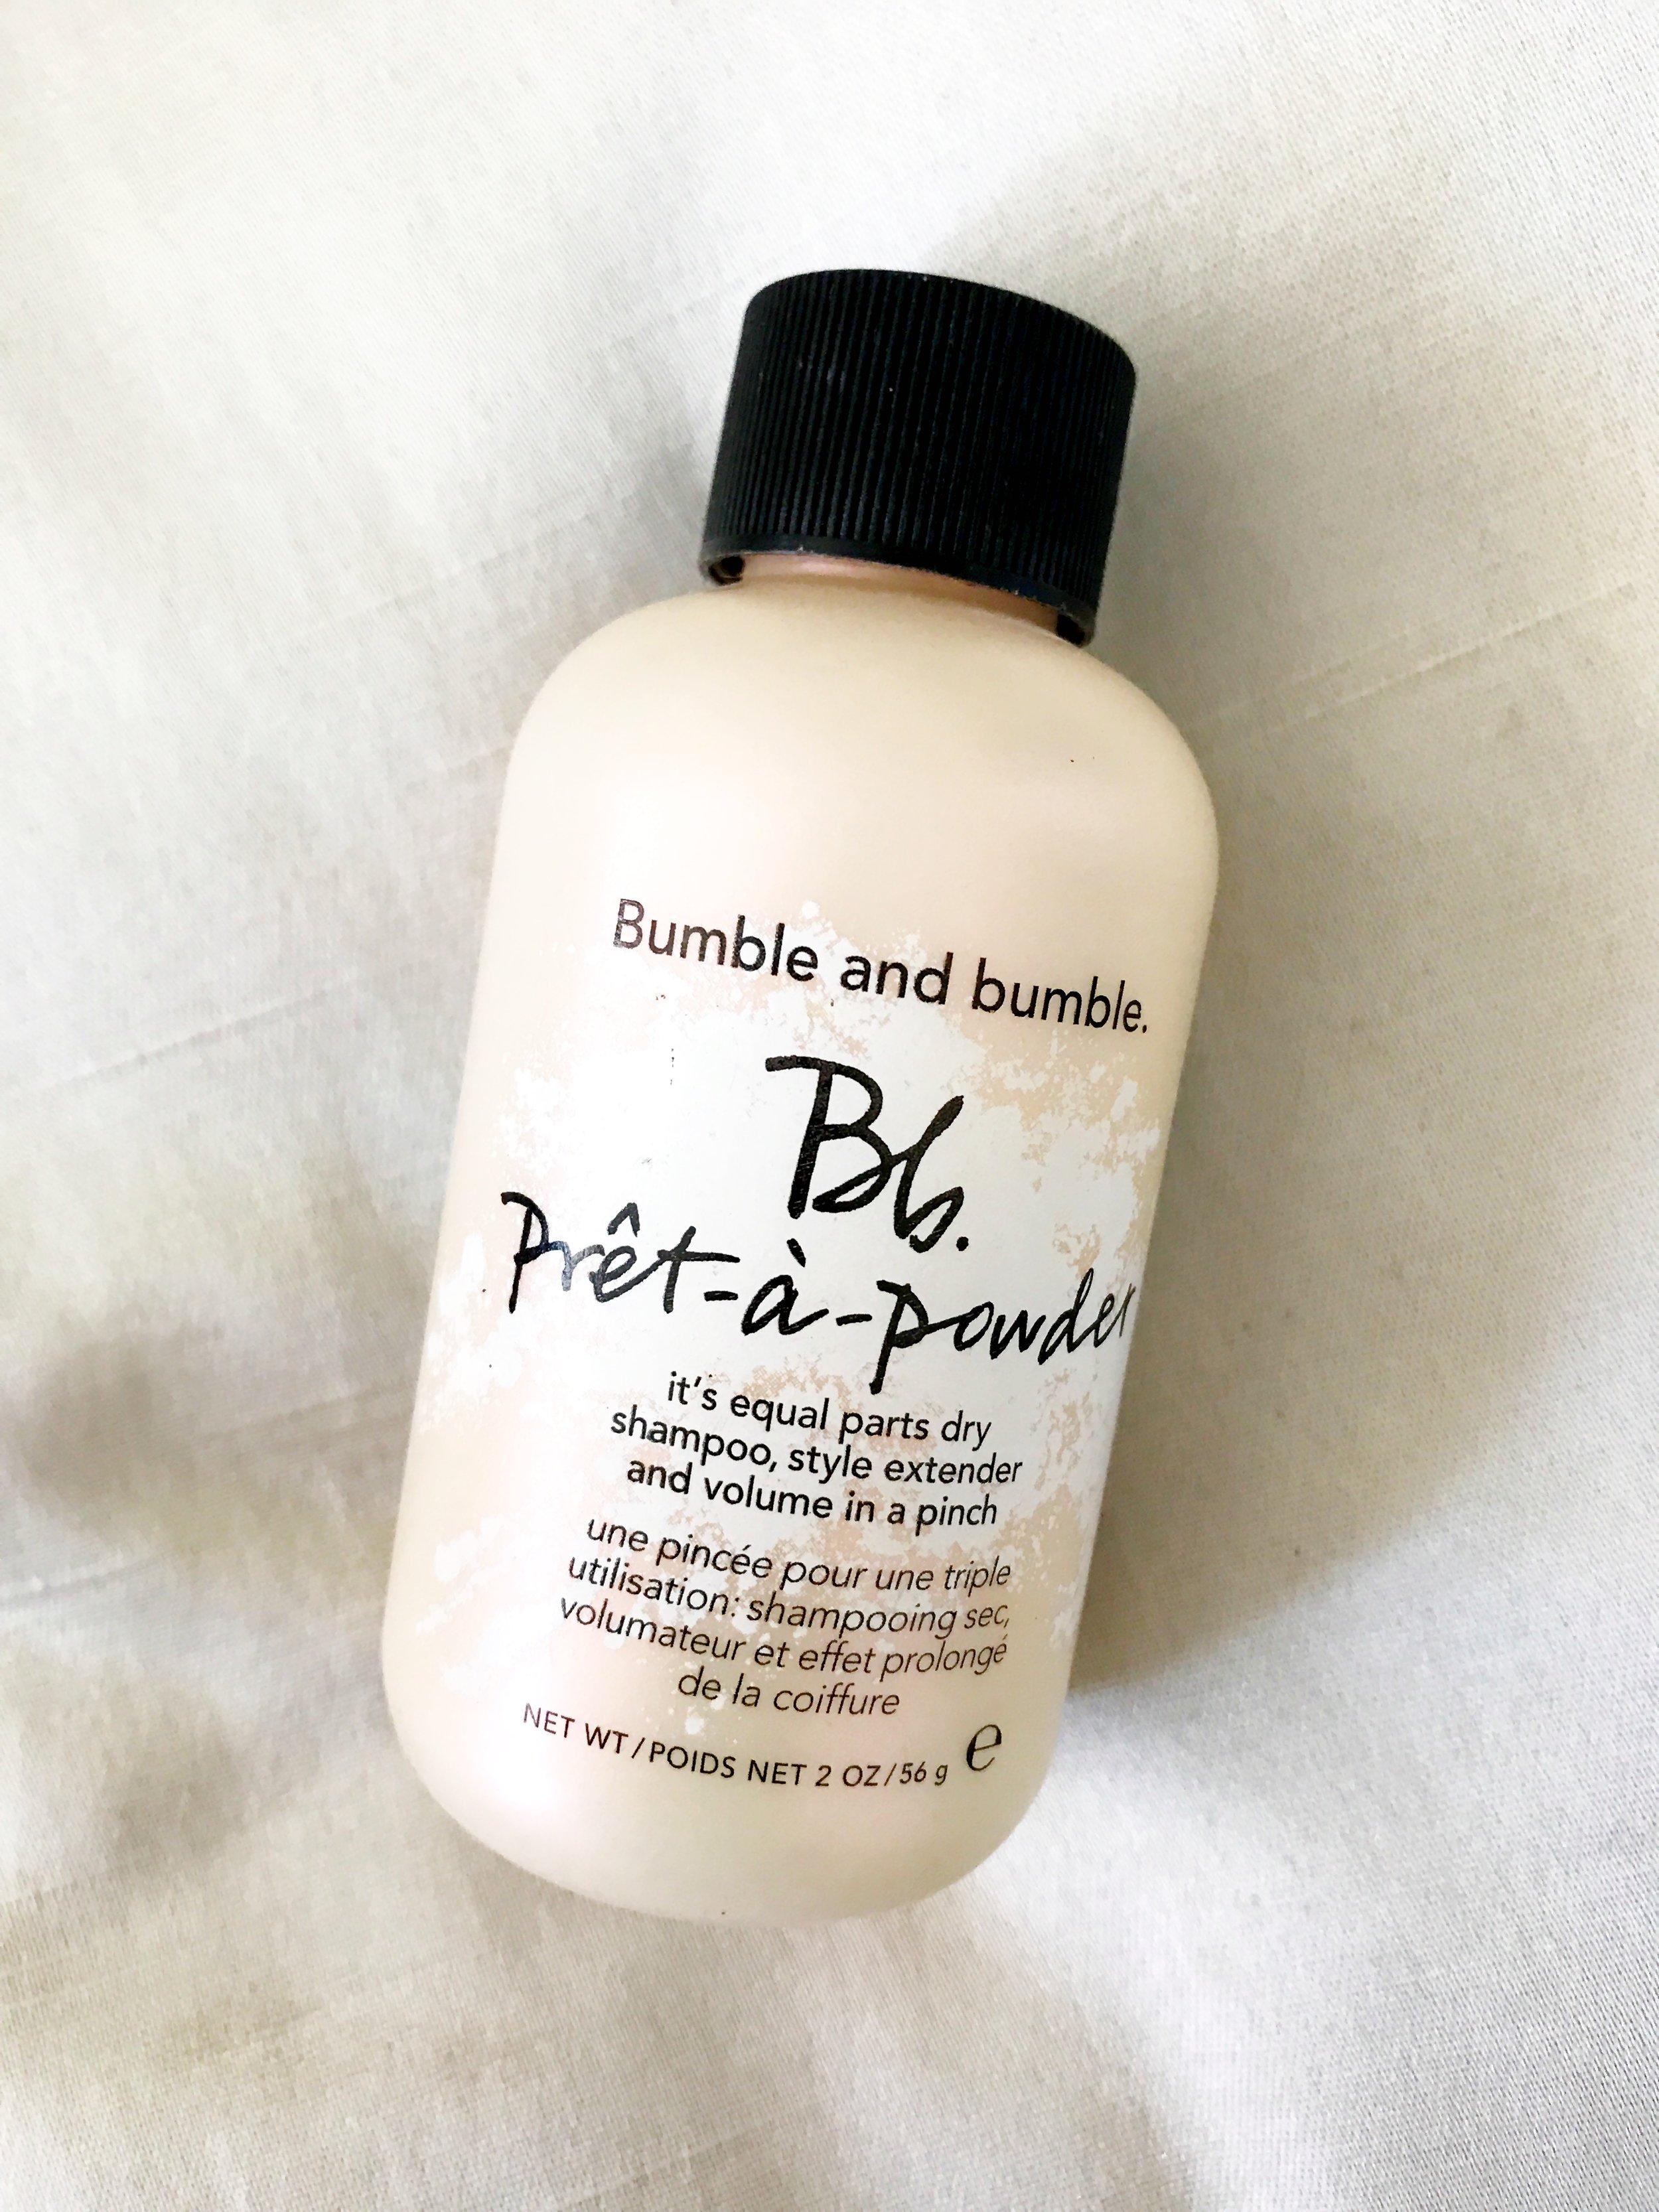 Prêt-à-powder by Bumble and bumble